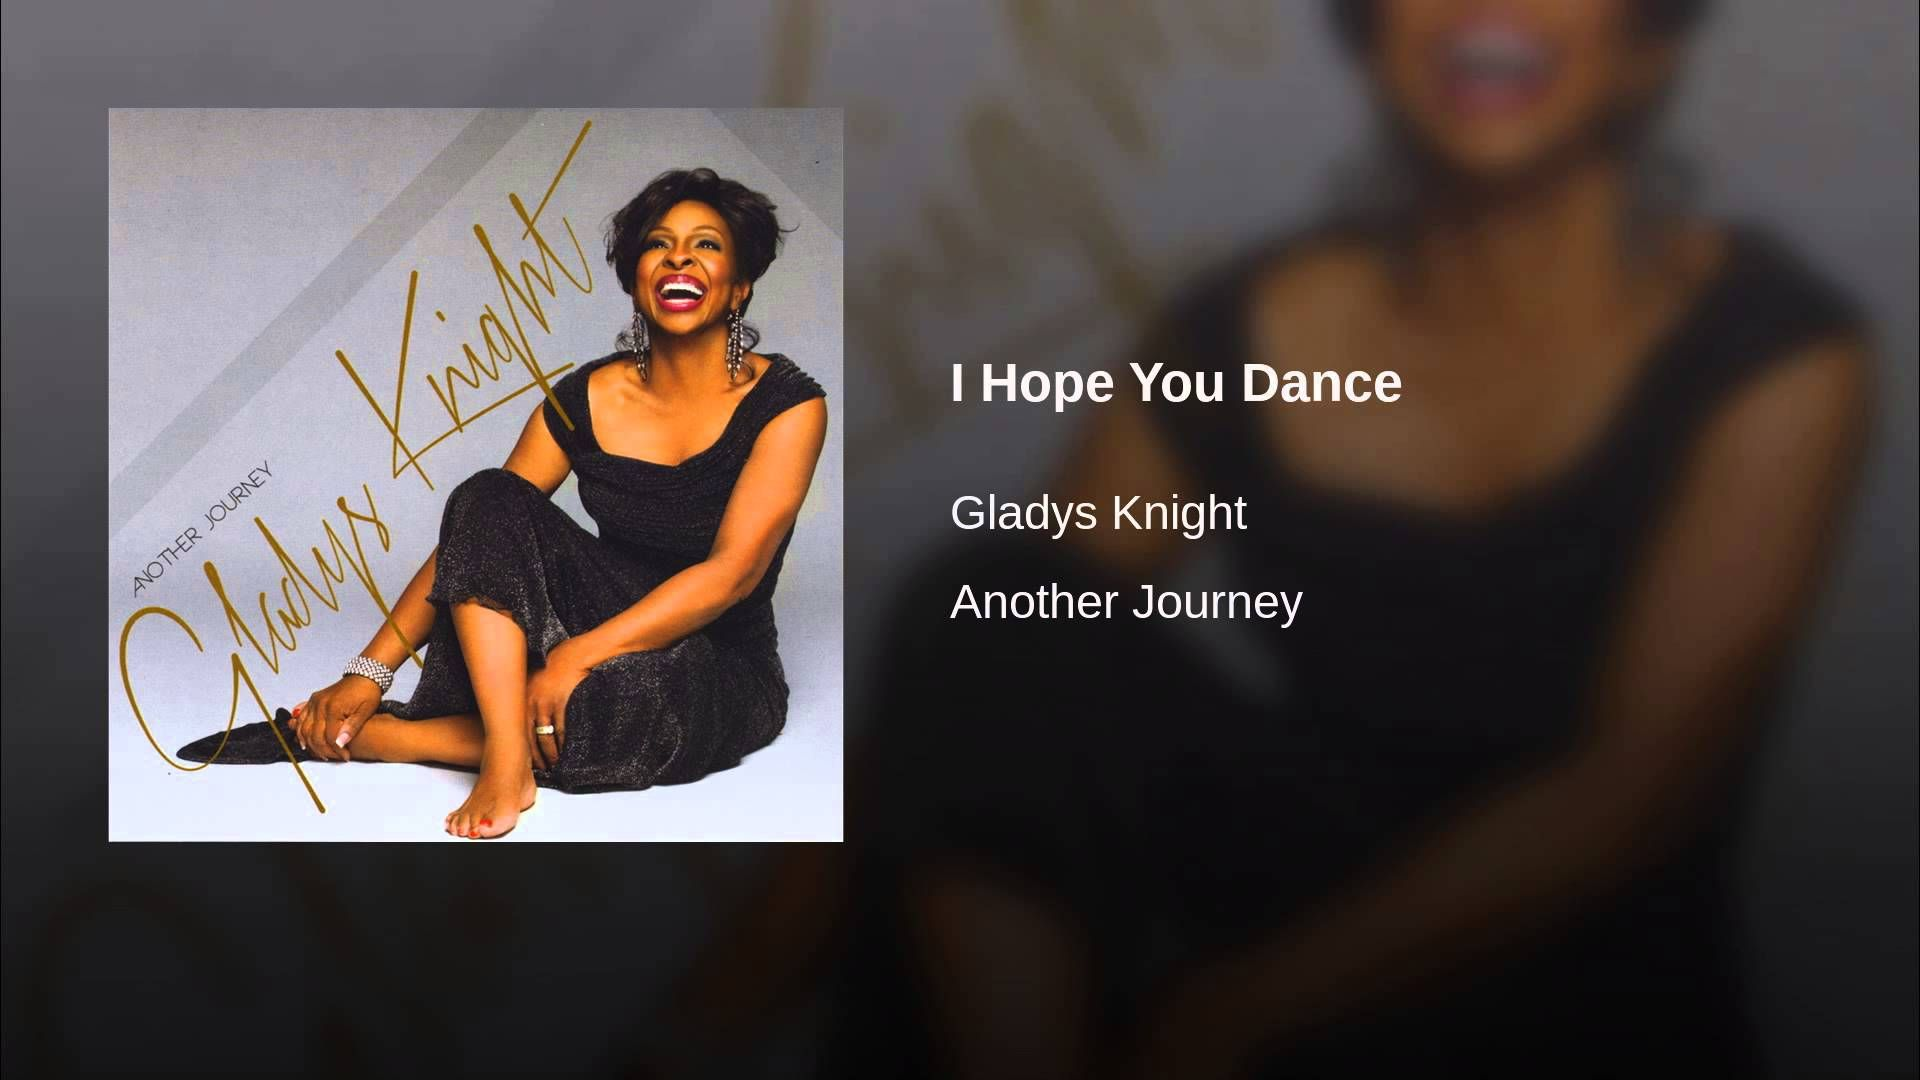 gladys knight i hope you dance